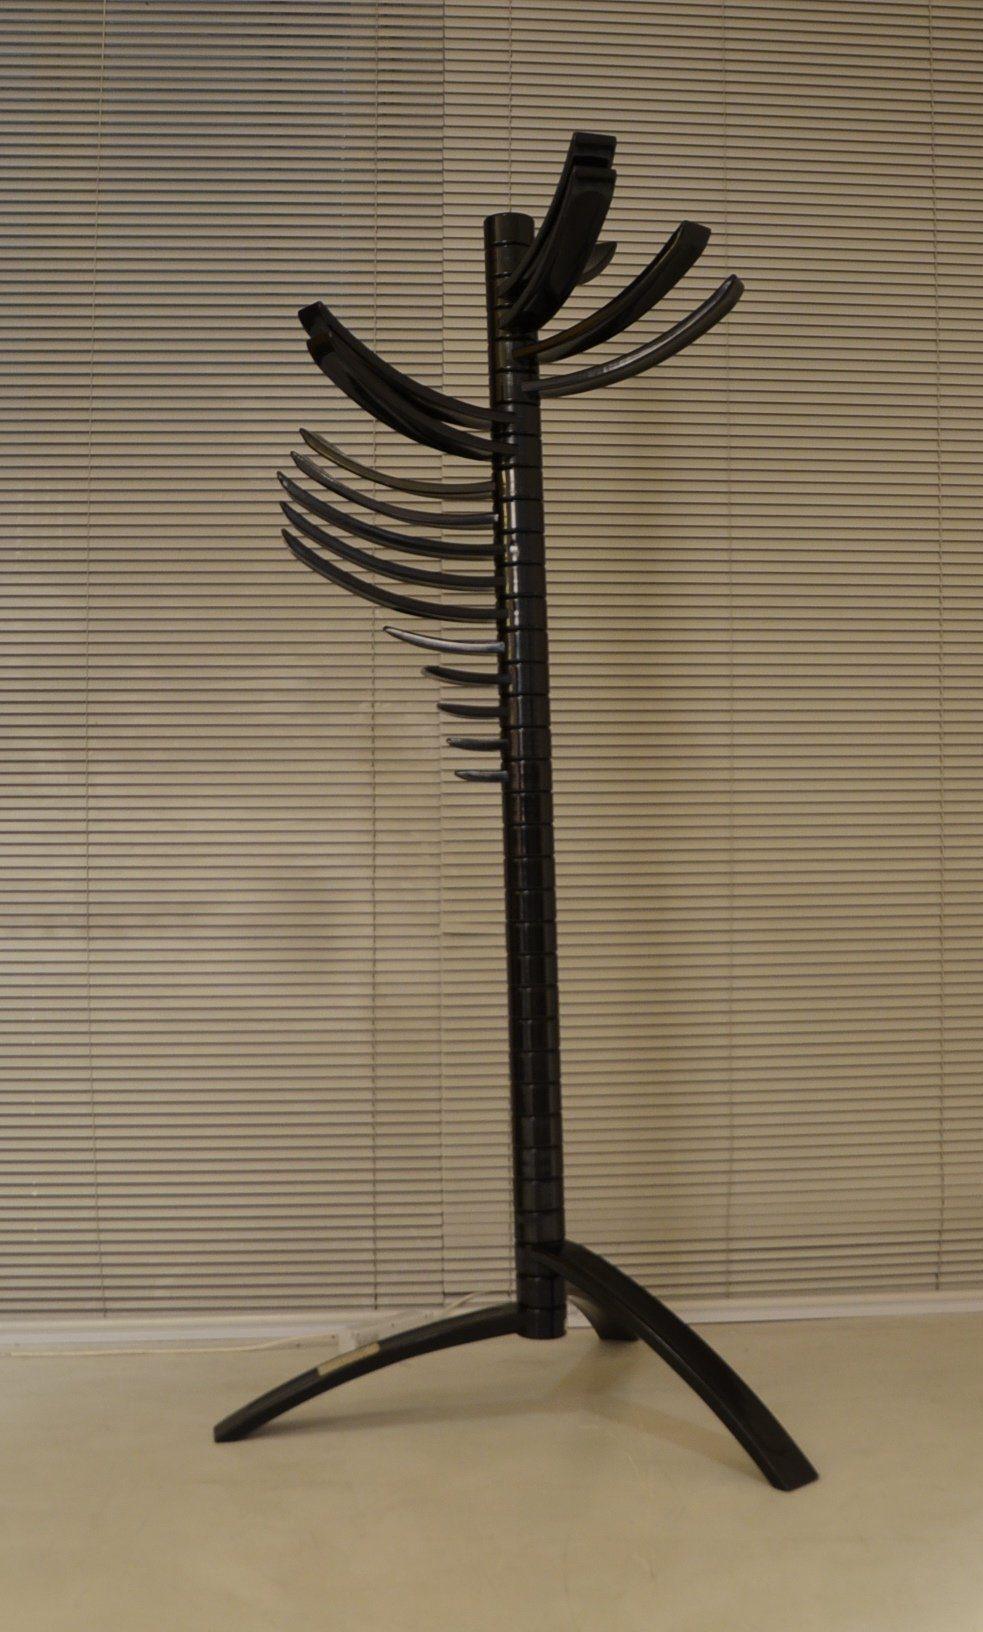 RENNA Bruce Tippet Knoll original design Made in Italy